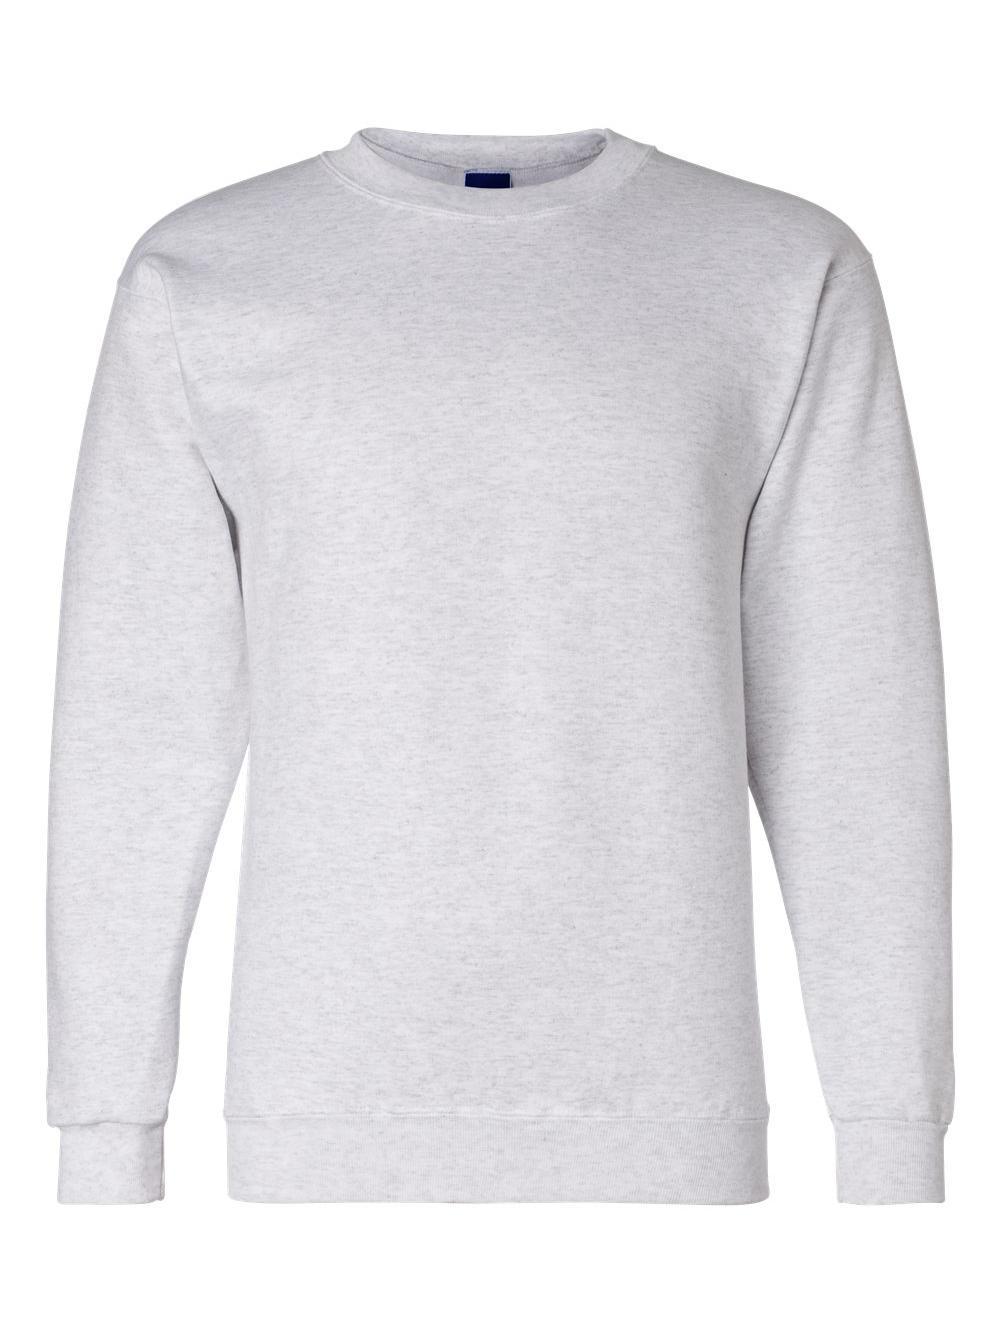 Champion-Double-Dry-Eco-Crewneck-Sweatshirt-S600 thumbnail 33